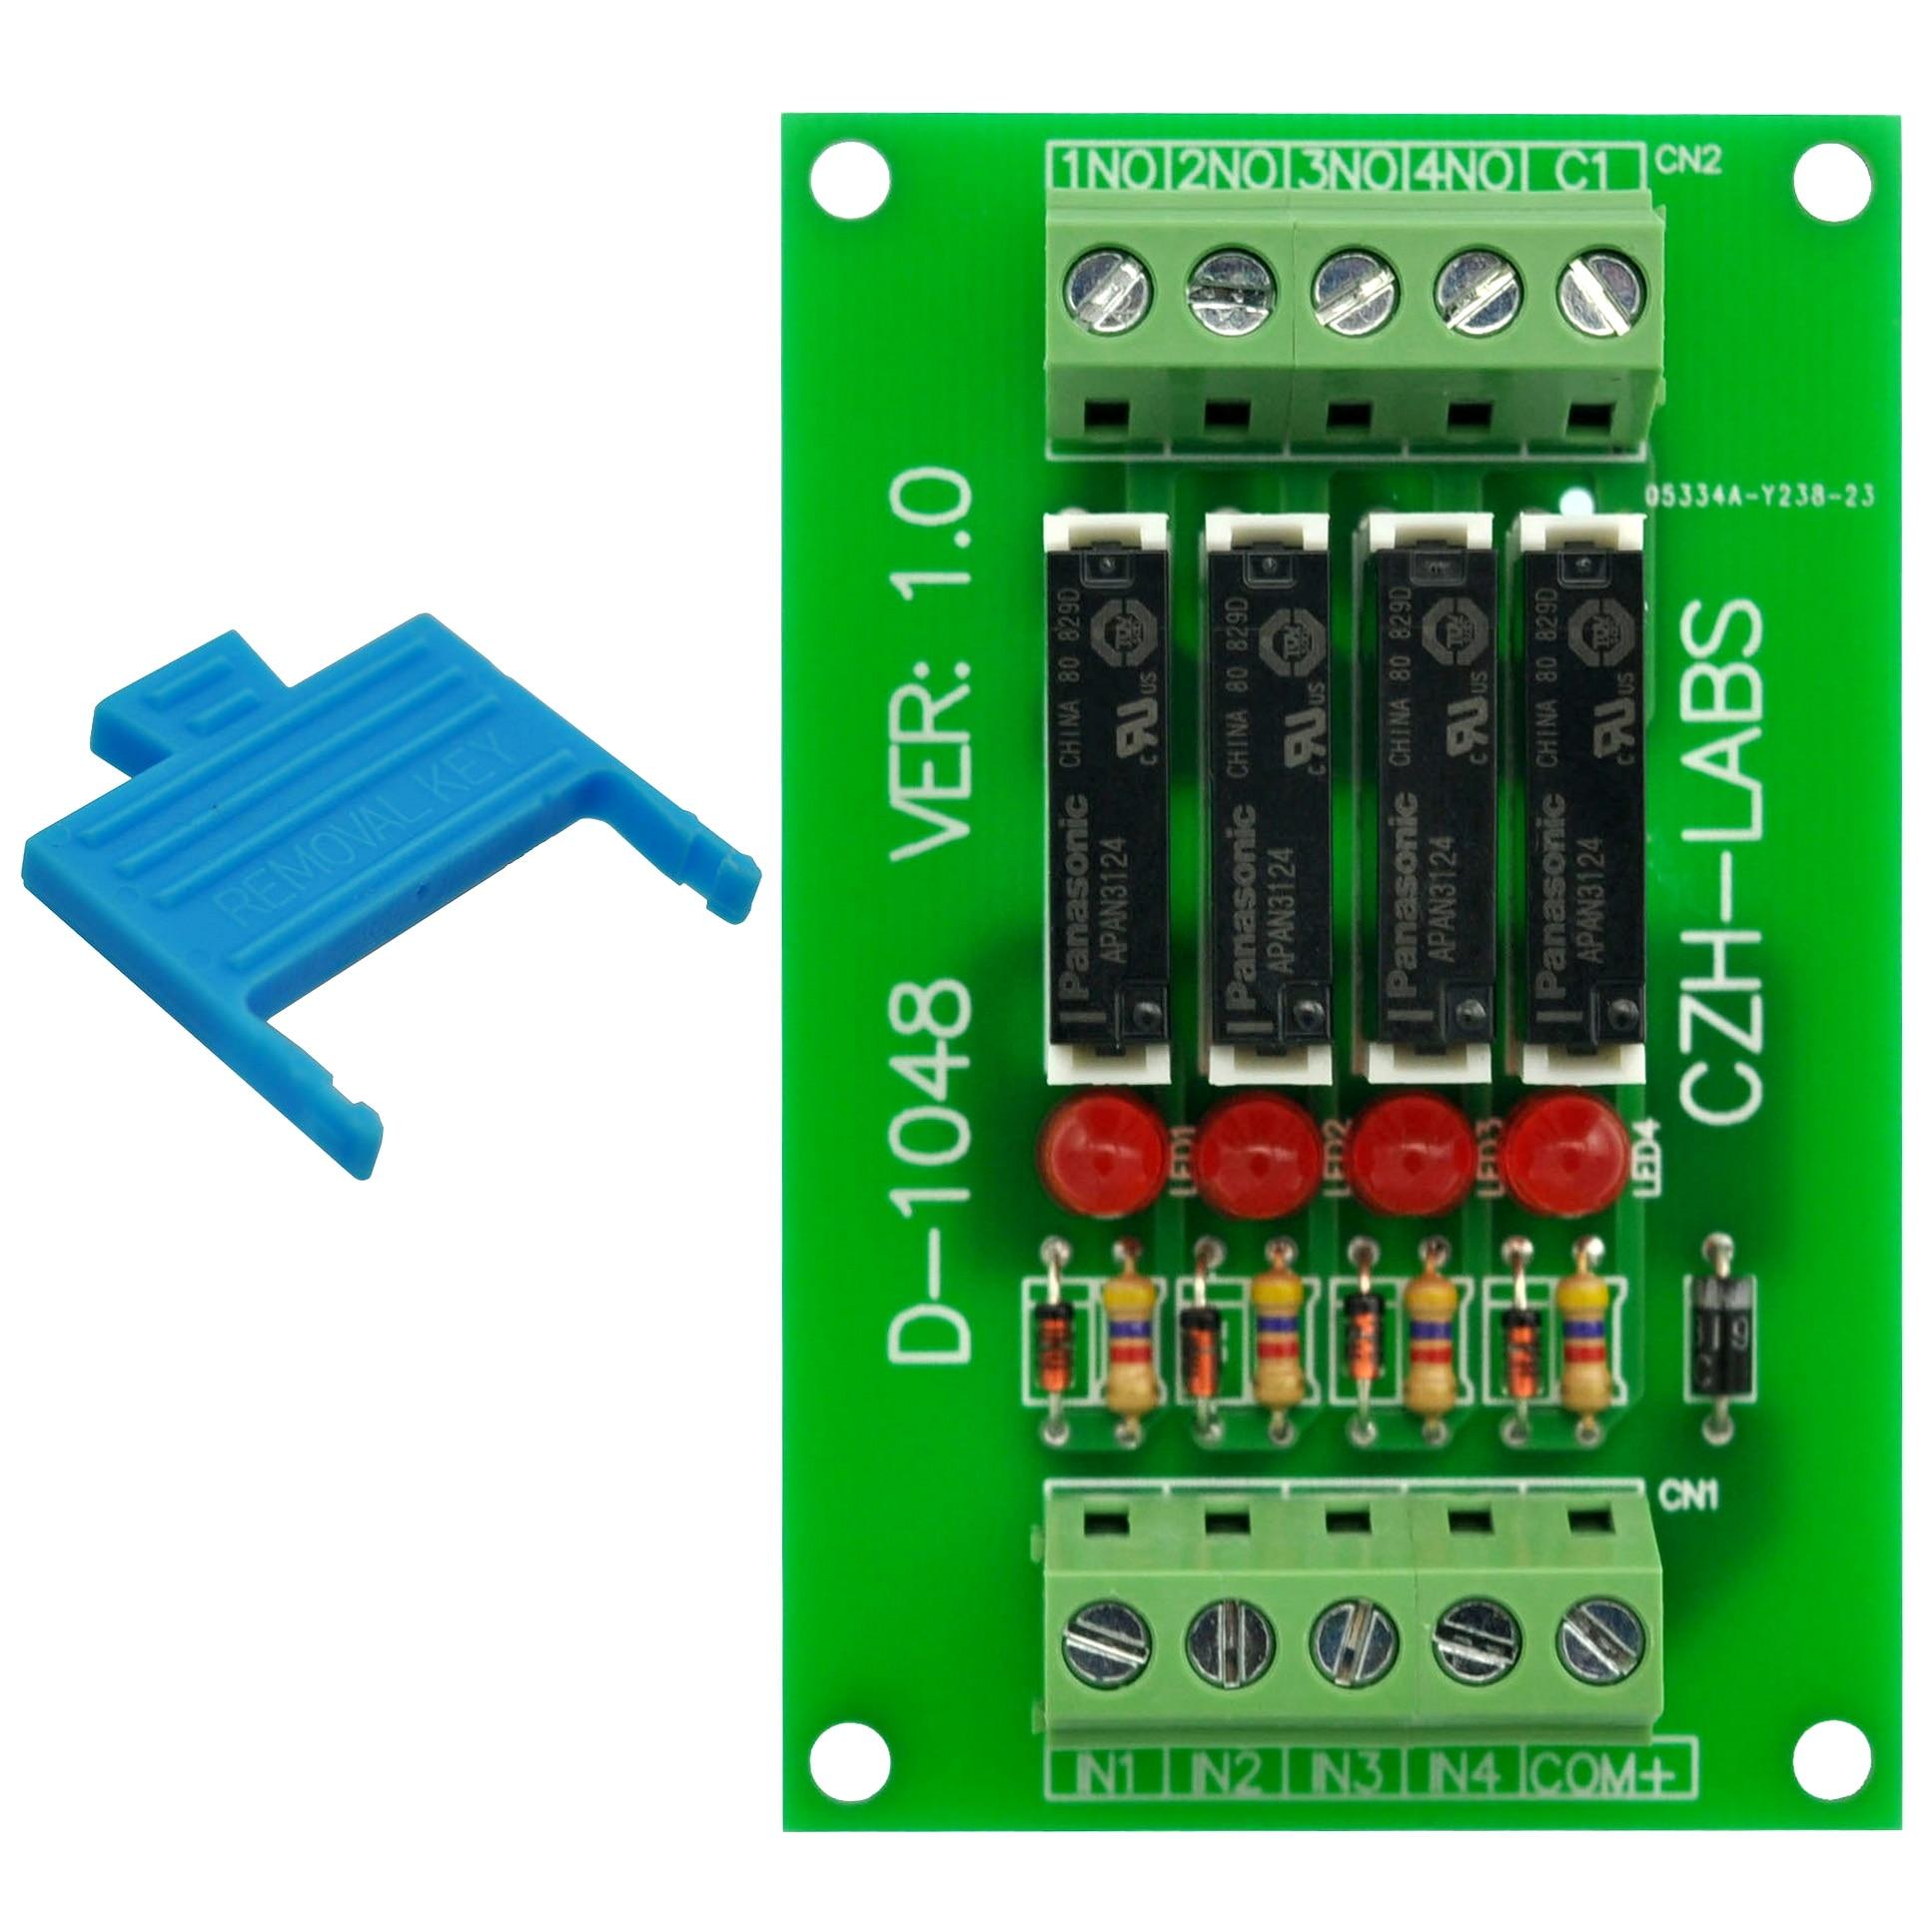 Slim Panel Mount DC24V Sink/NPN 4 SPST-NO 5A Power Relay Module, APAN3124